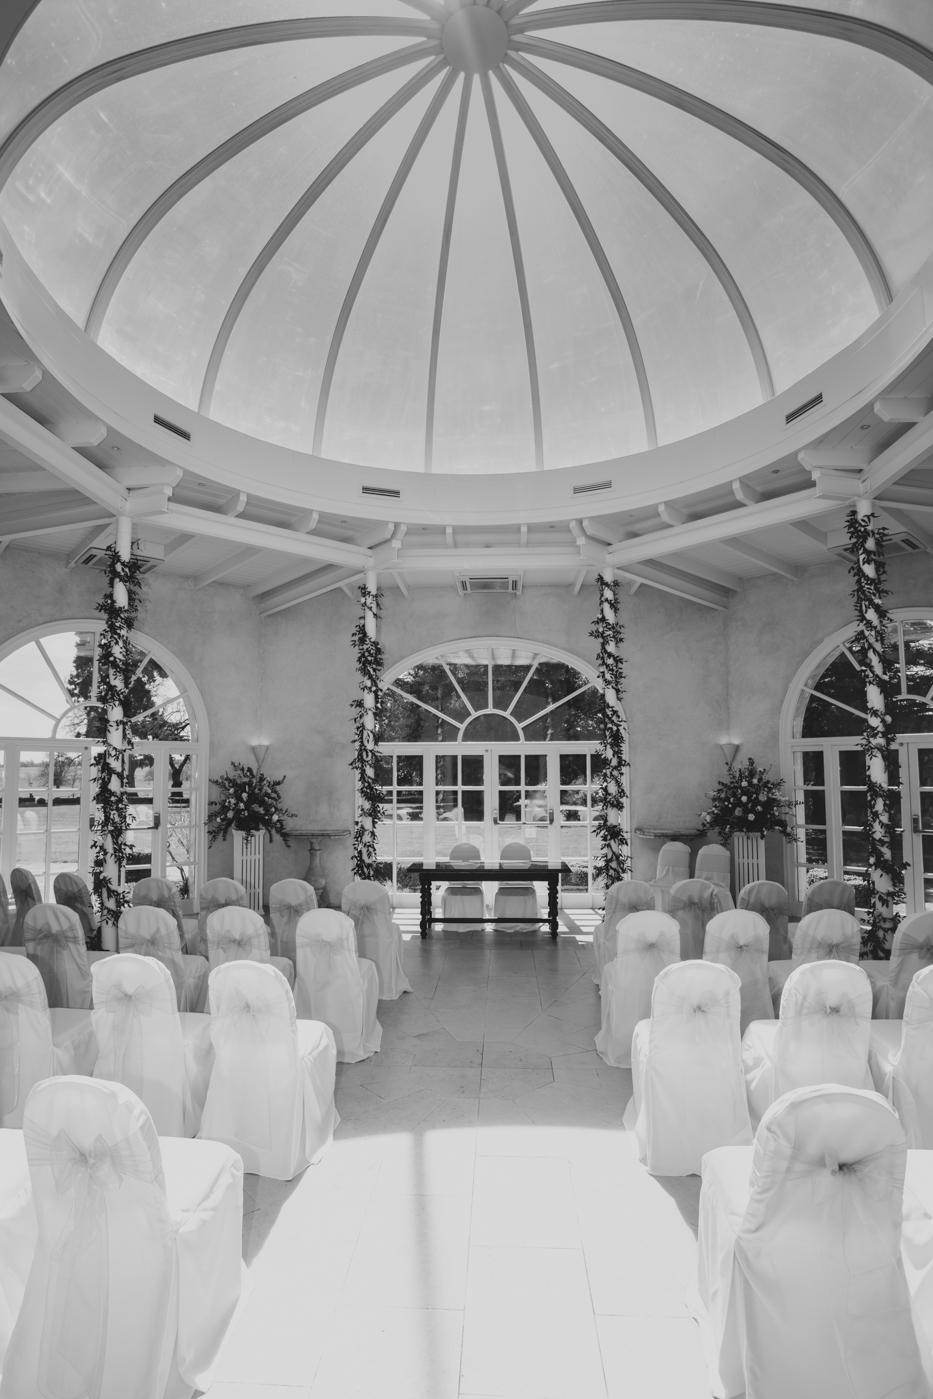 035 Stapleford Park Wedding Photography Award winning Wedding Photographer and Videographer Mark Pugh www.markpugh.com.JPG